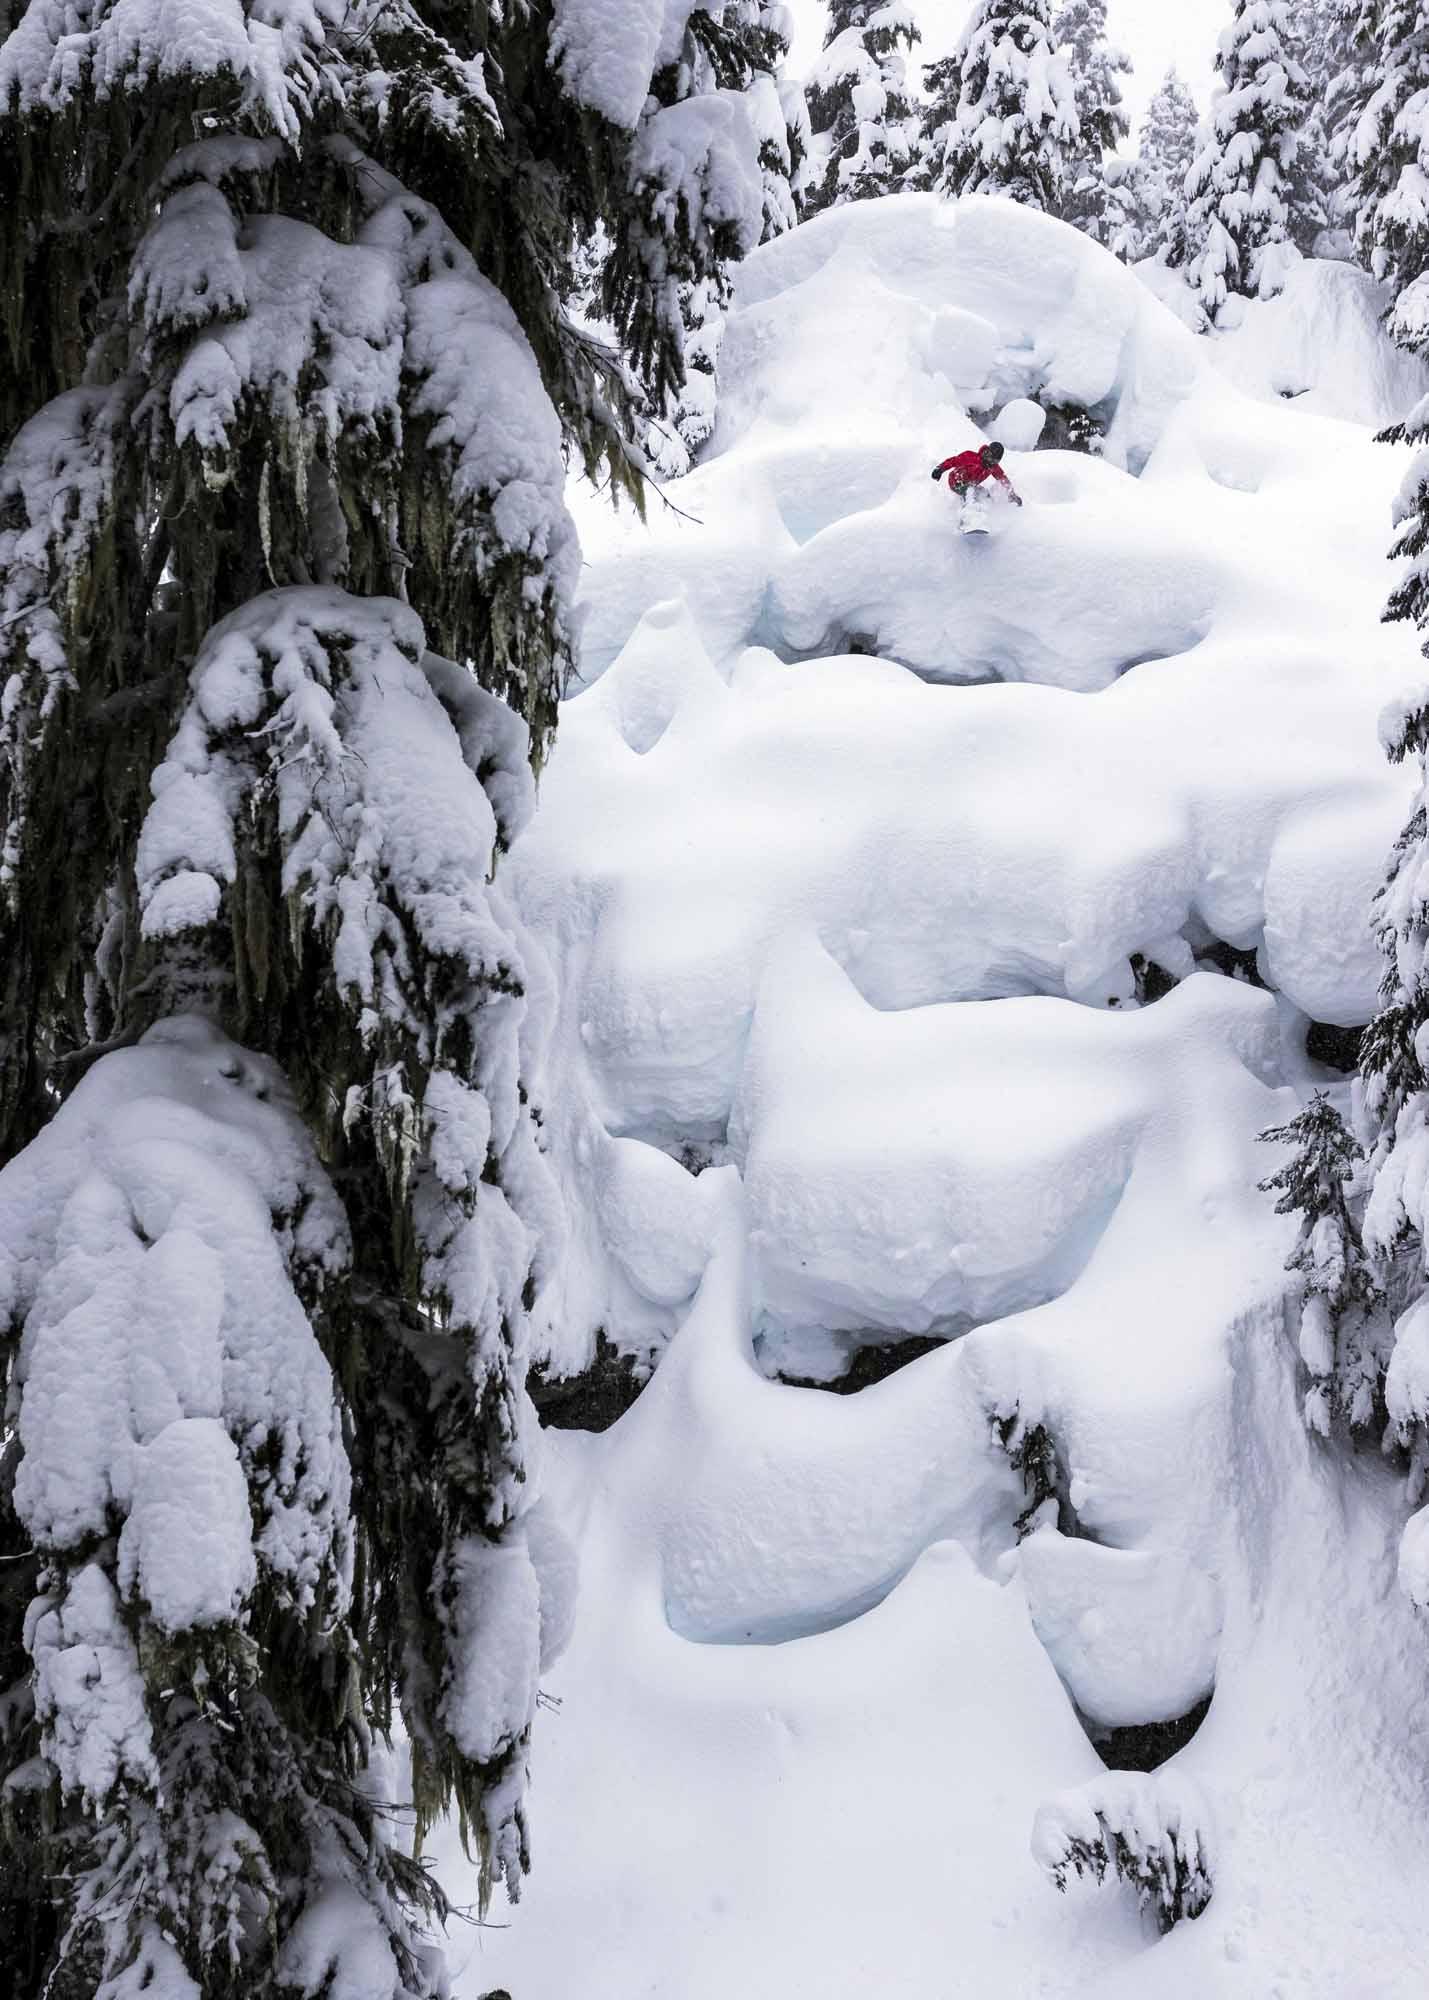 Pillow-Fights-in-the-Sea-to-Sky-Brandywine-snowboarder-Leanne-Pelosi-photo-Ben-Girardi